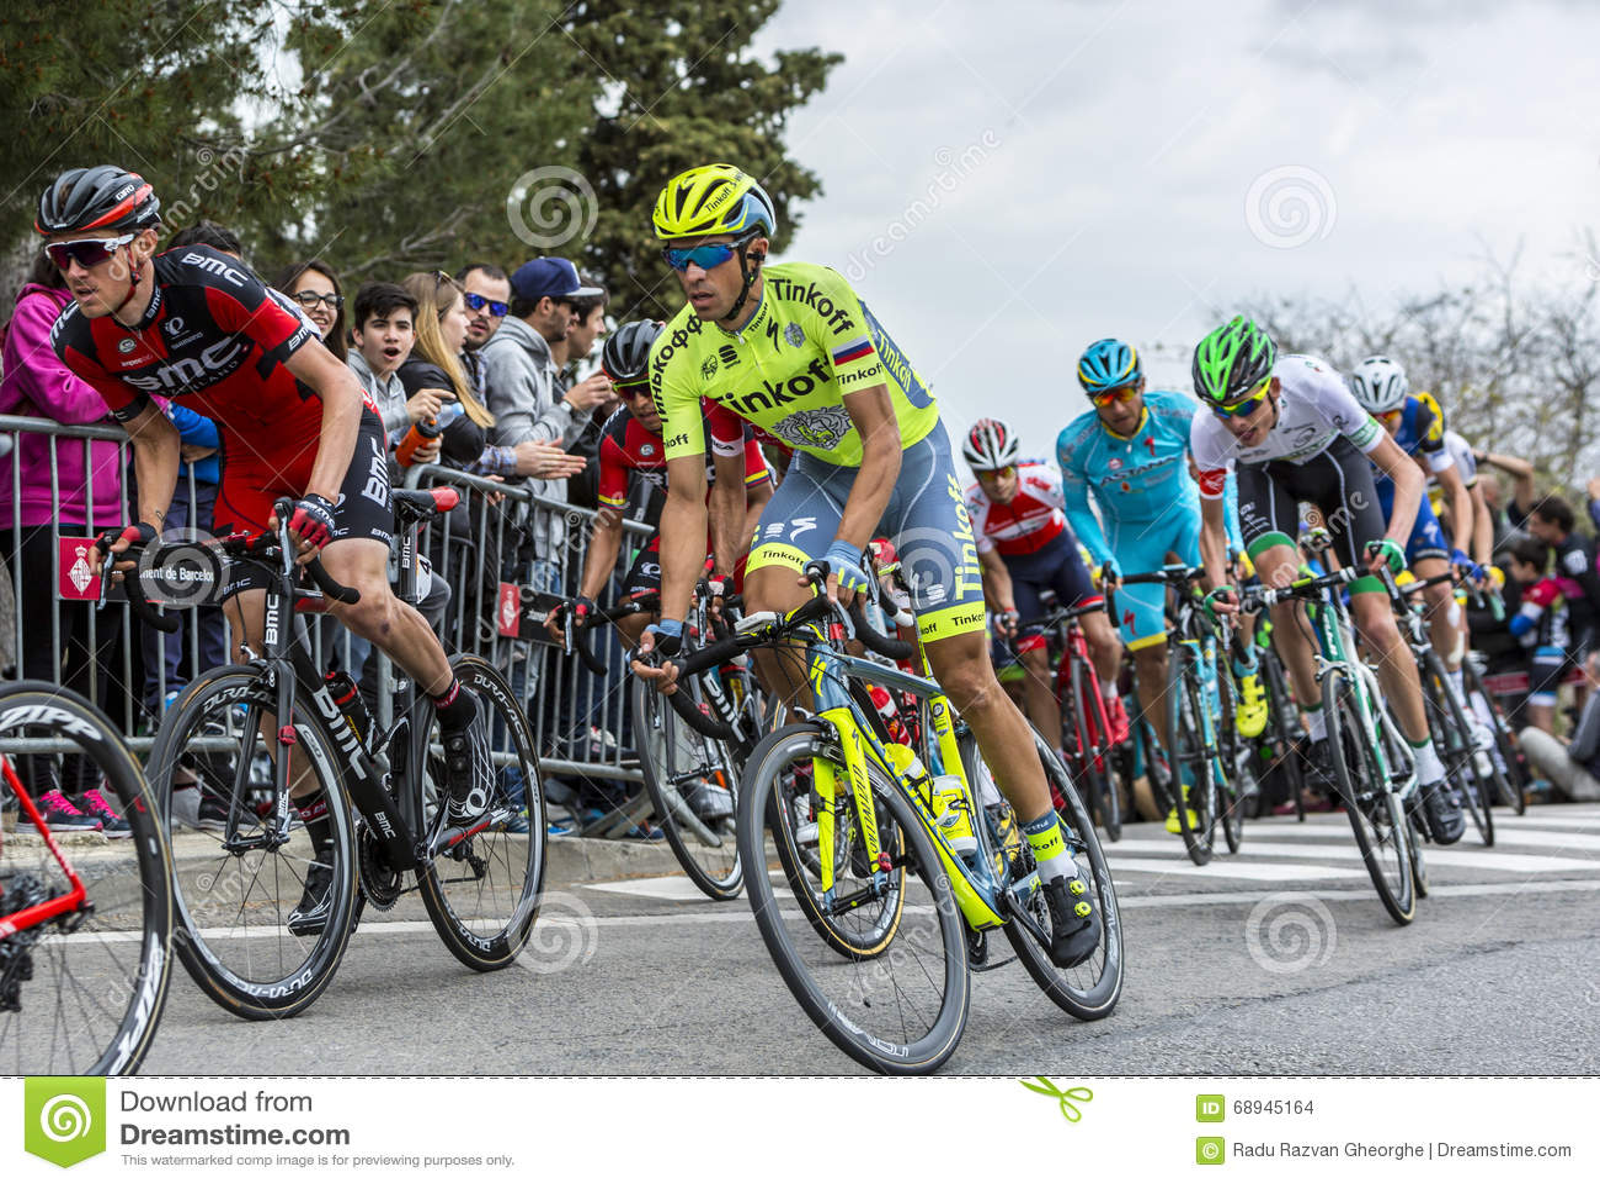 661966b91 Inside The Peloton Tour De Catalunya 2016 Editorial Stock Image Image   68945164